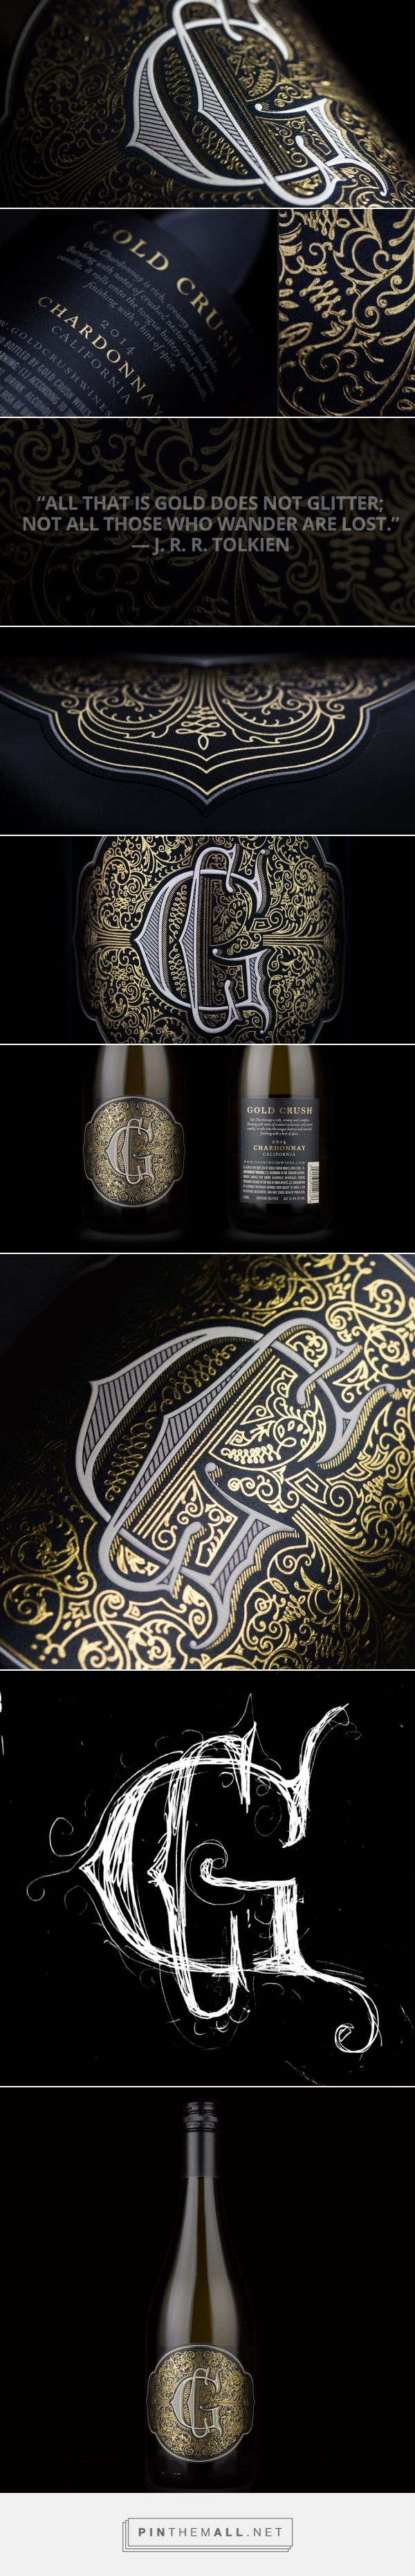 Gold Crush wine label design by Makers & Allies (USA) - http://www.packagingoftheworld.com/2016/06/gold-crush.html